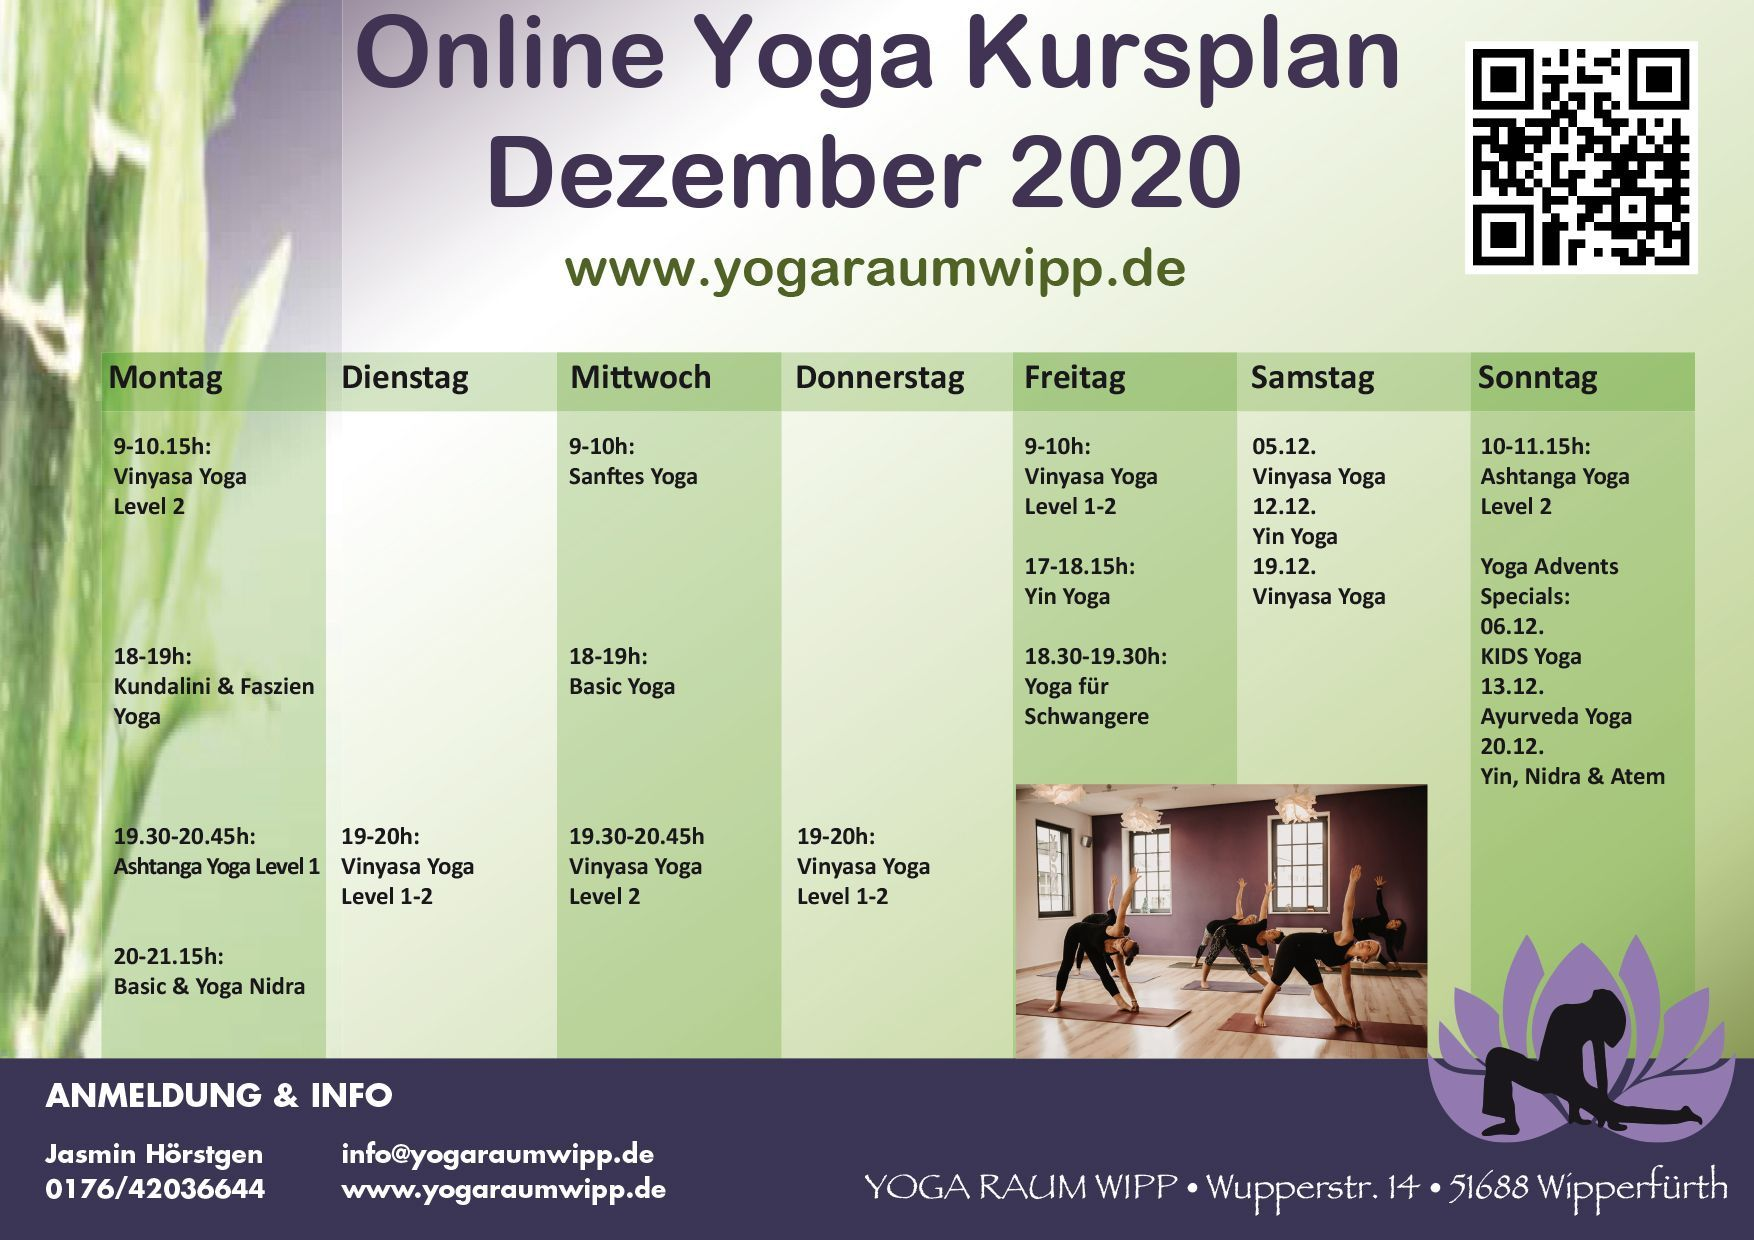 Kursplan 2020 | Yoga Raum Wipp